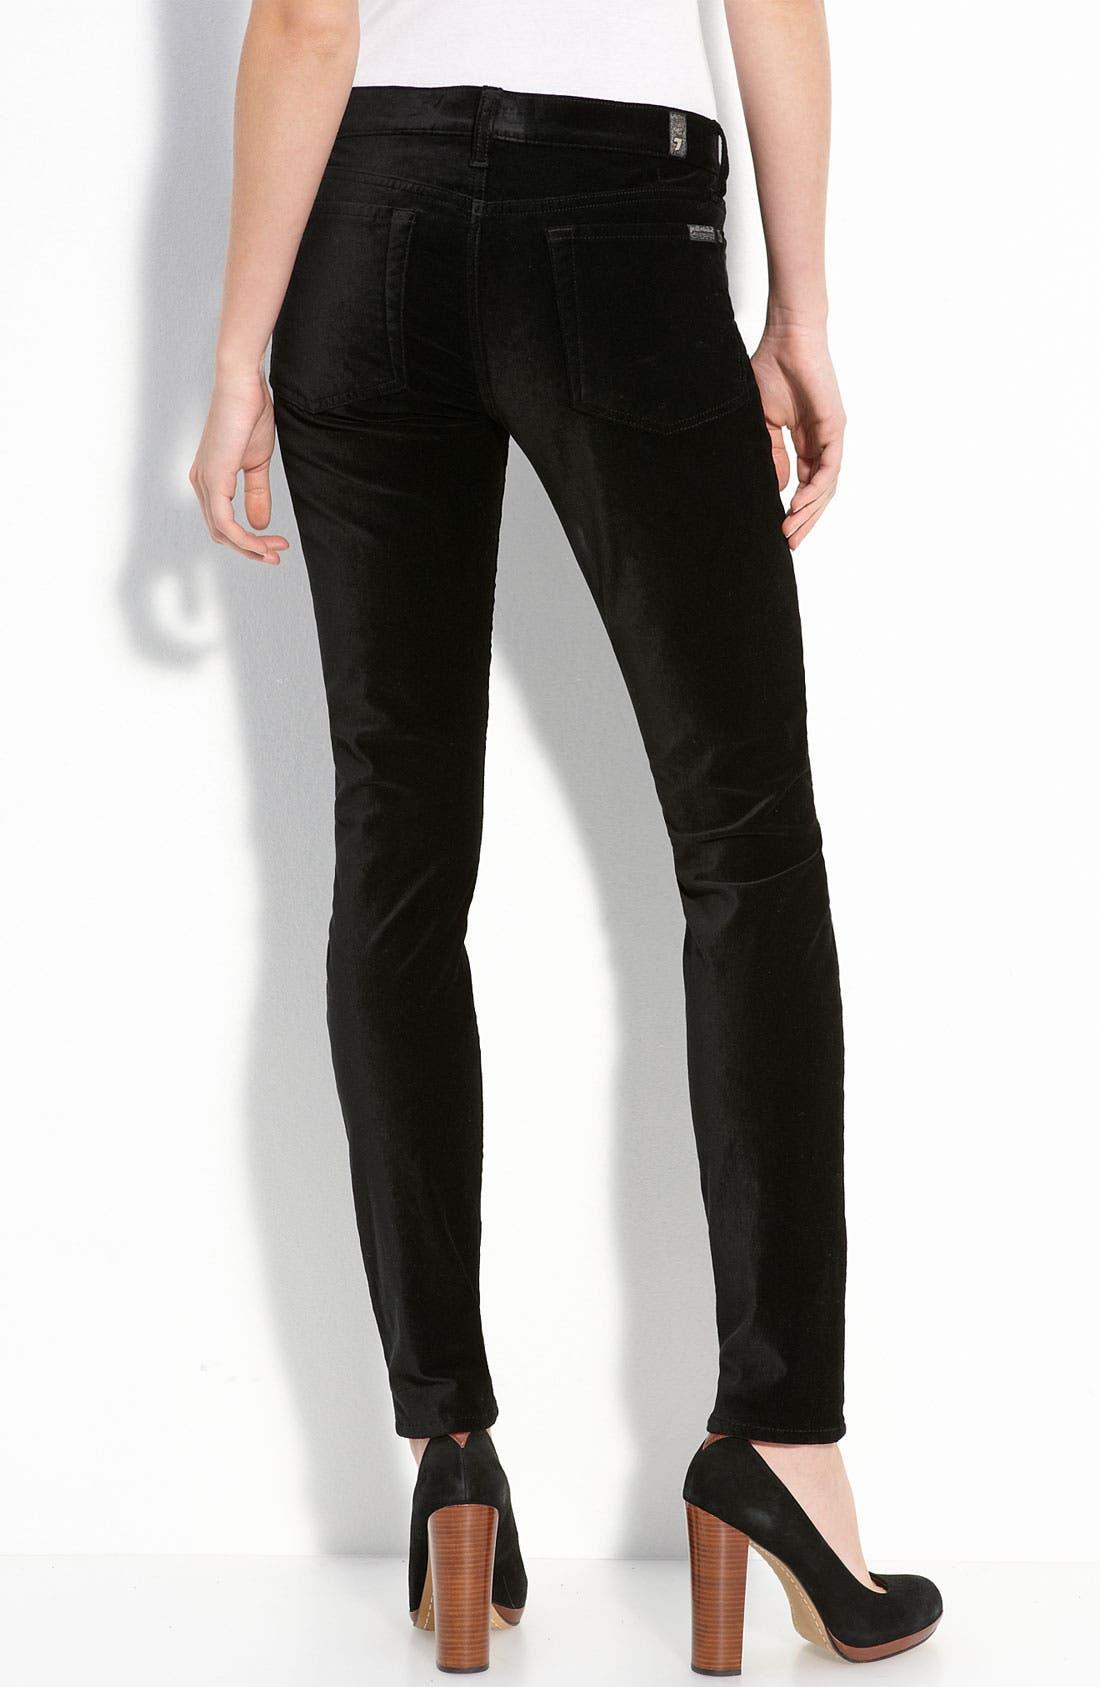 'The Skinny' Stretch Velvet Jeans,                             Main thumbnail 1, color,                             001